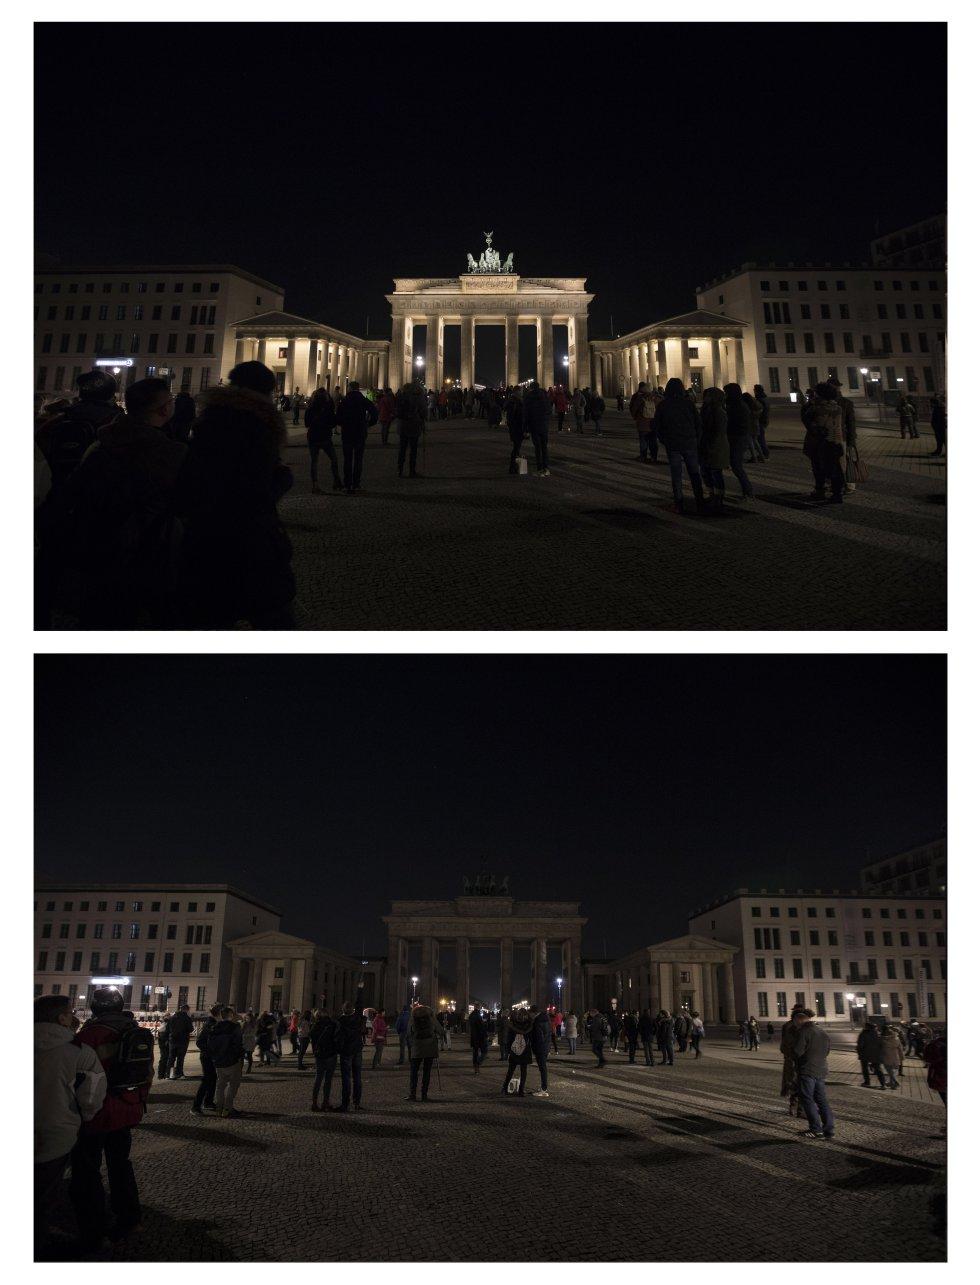 Puerta de Brandemburgo - Berlin, Alemania